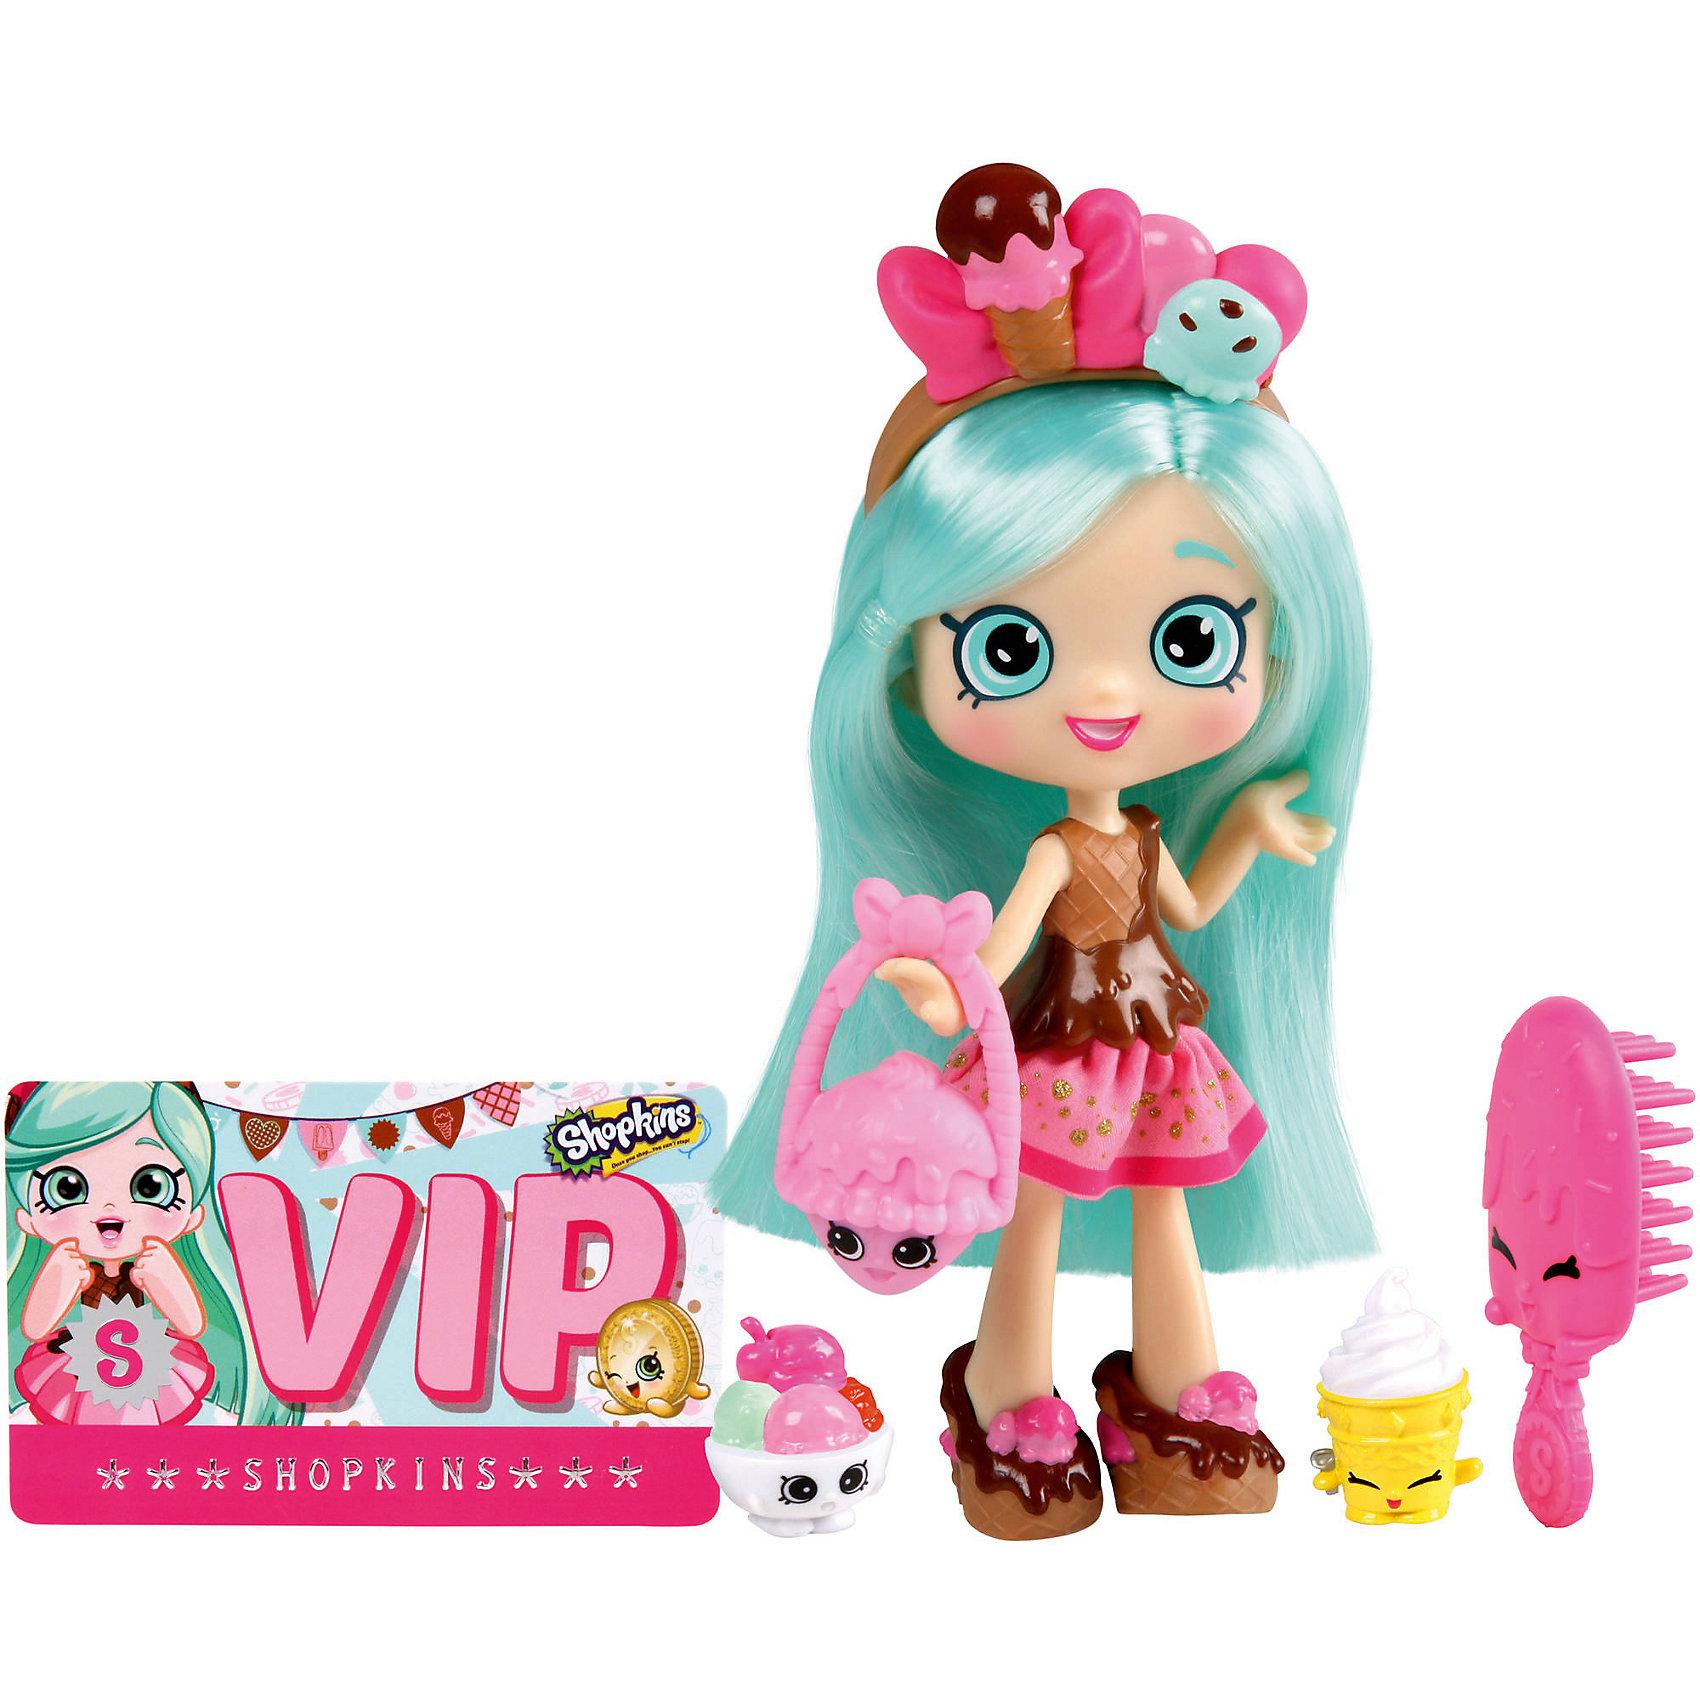 Moose Кукла Пеппа-Минт с аксессуарами, Shopkins куклы moose кукла